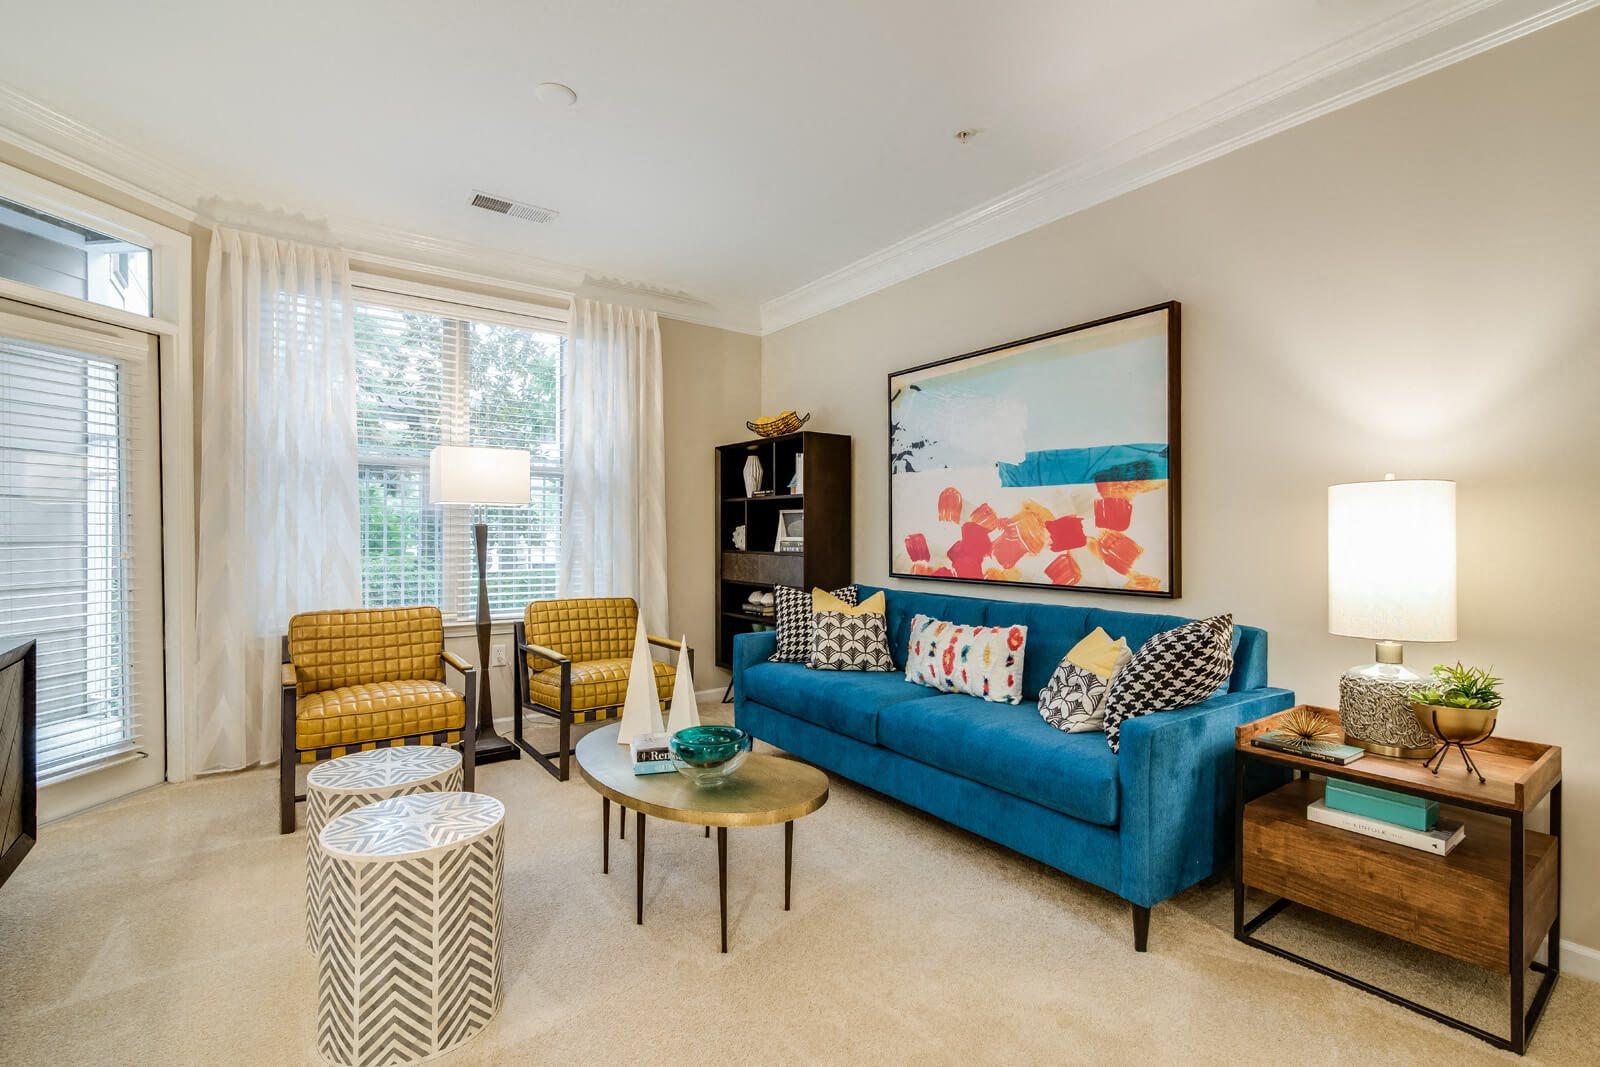 Patios & Balconies in Select Apartments at Windsor at Contee Crossing, Laurel, 20707